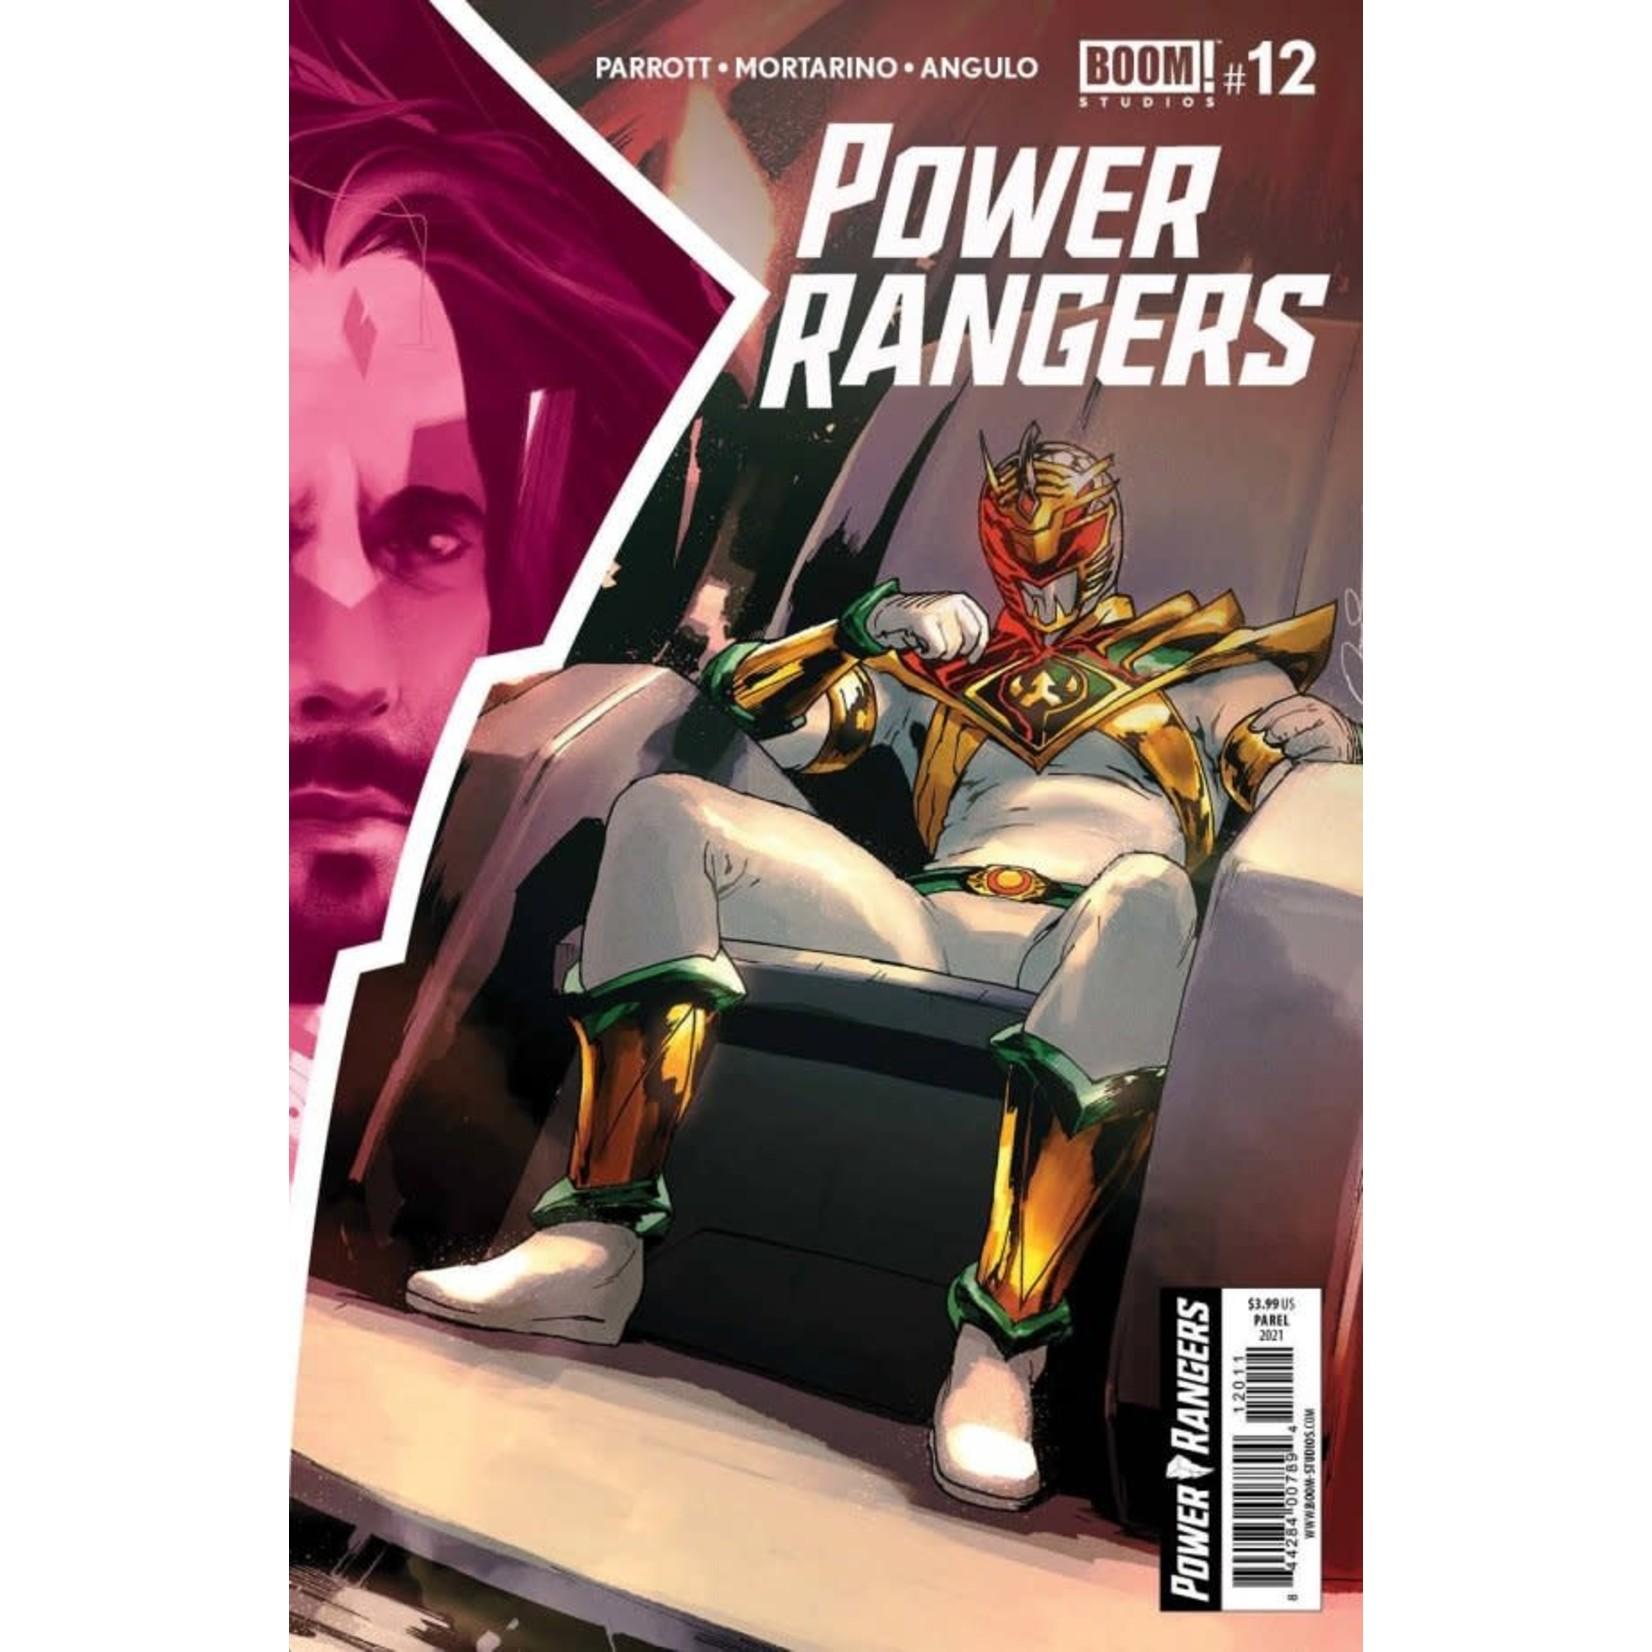 Boom Power Rangers #12